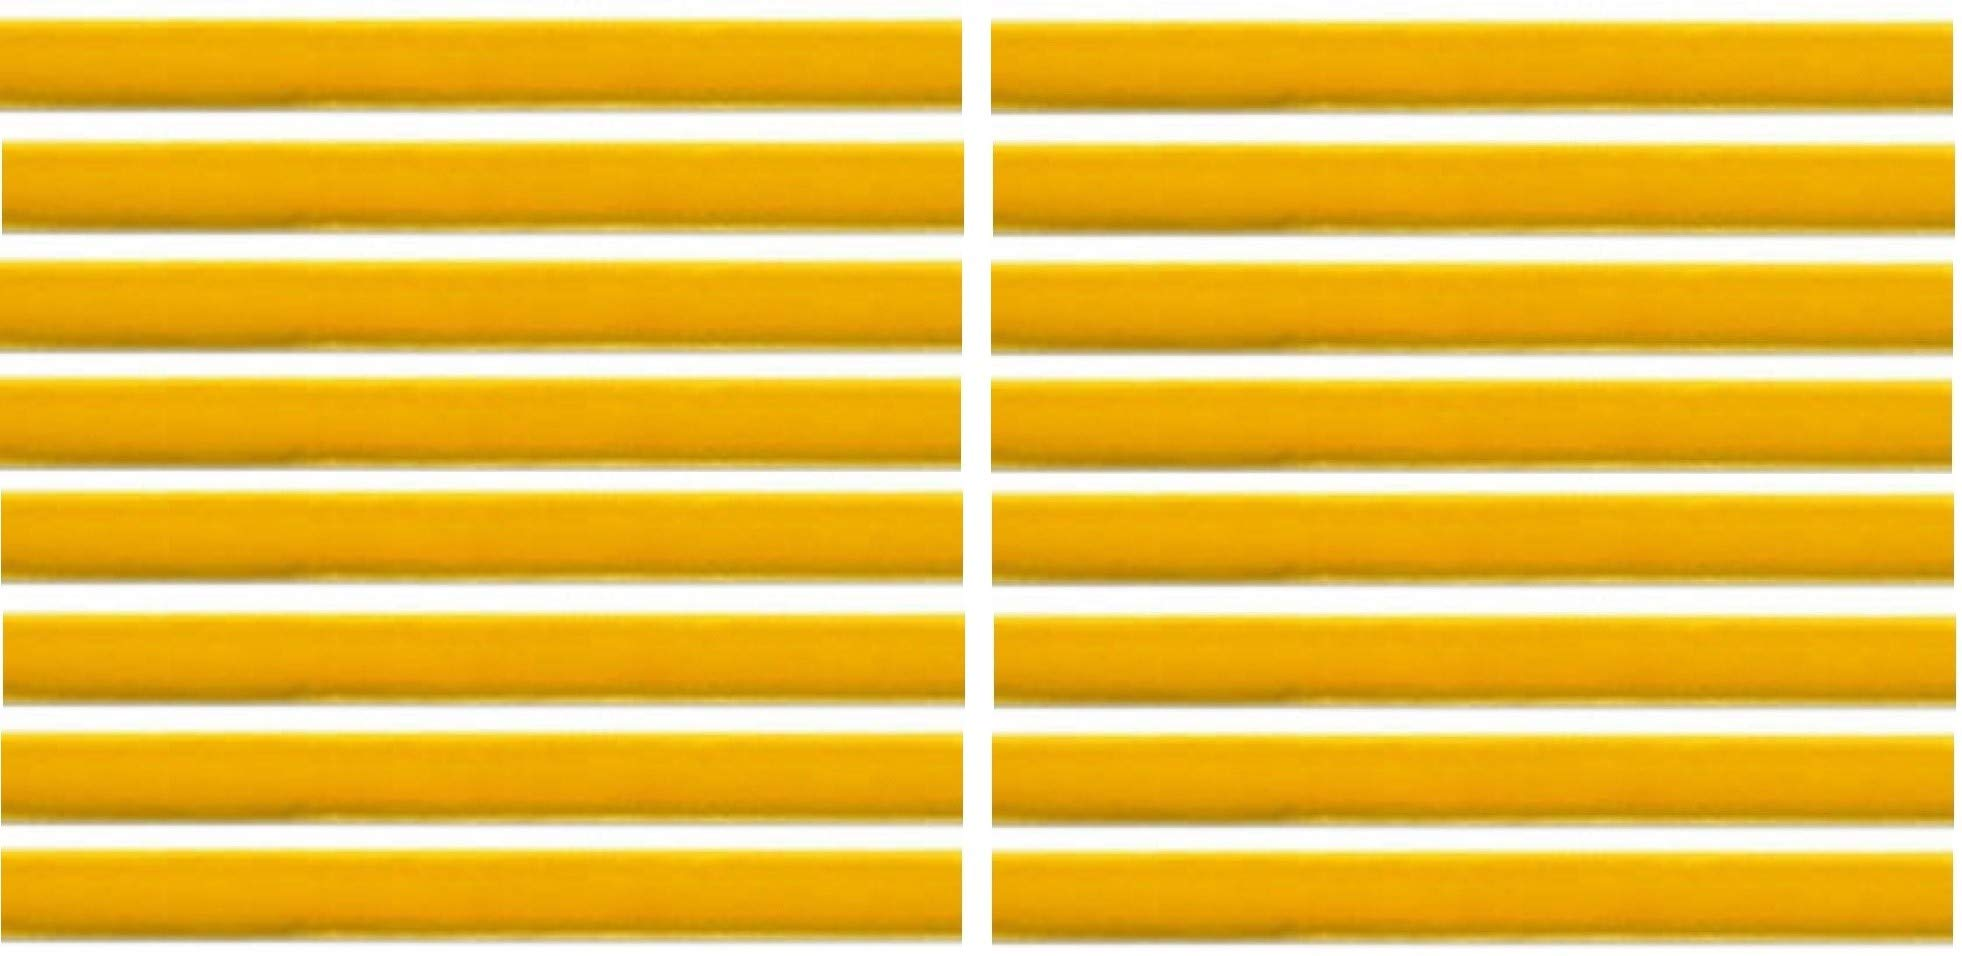 Yellow Gold Replacement Cleaning Strips (16-Pack) VPI Okki Nokki 3M LP Vinyl Record Album